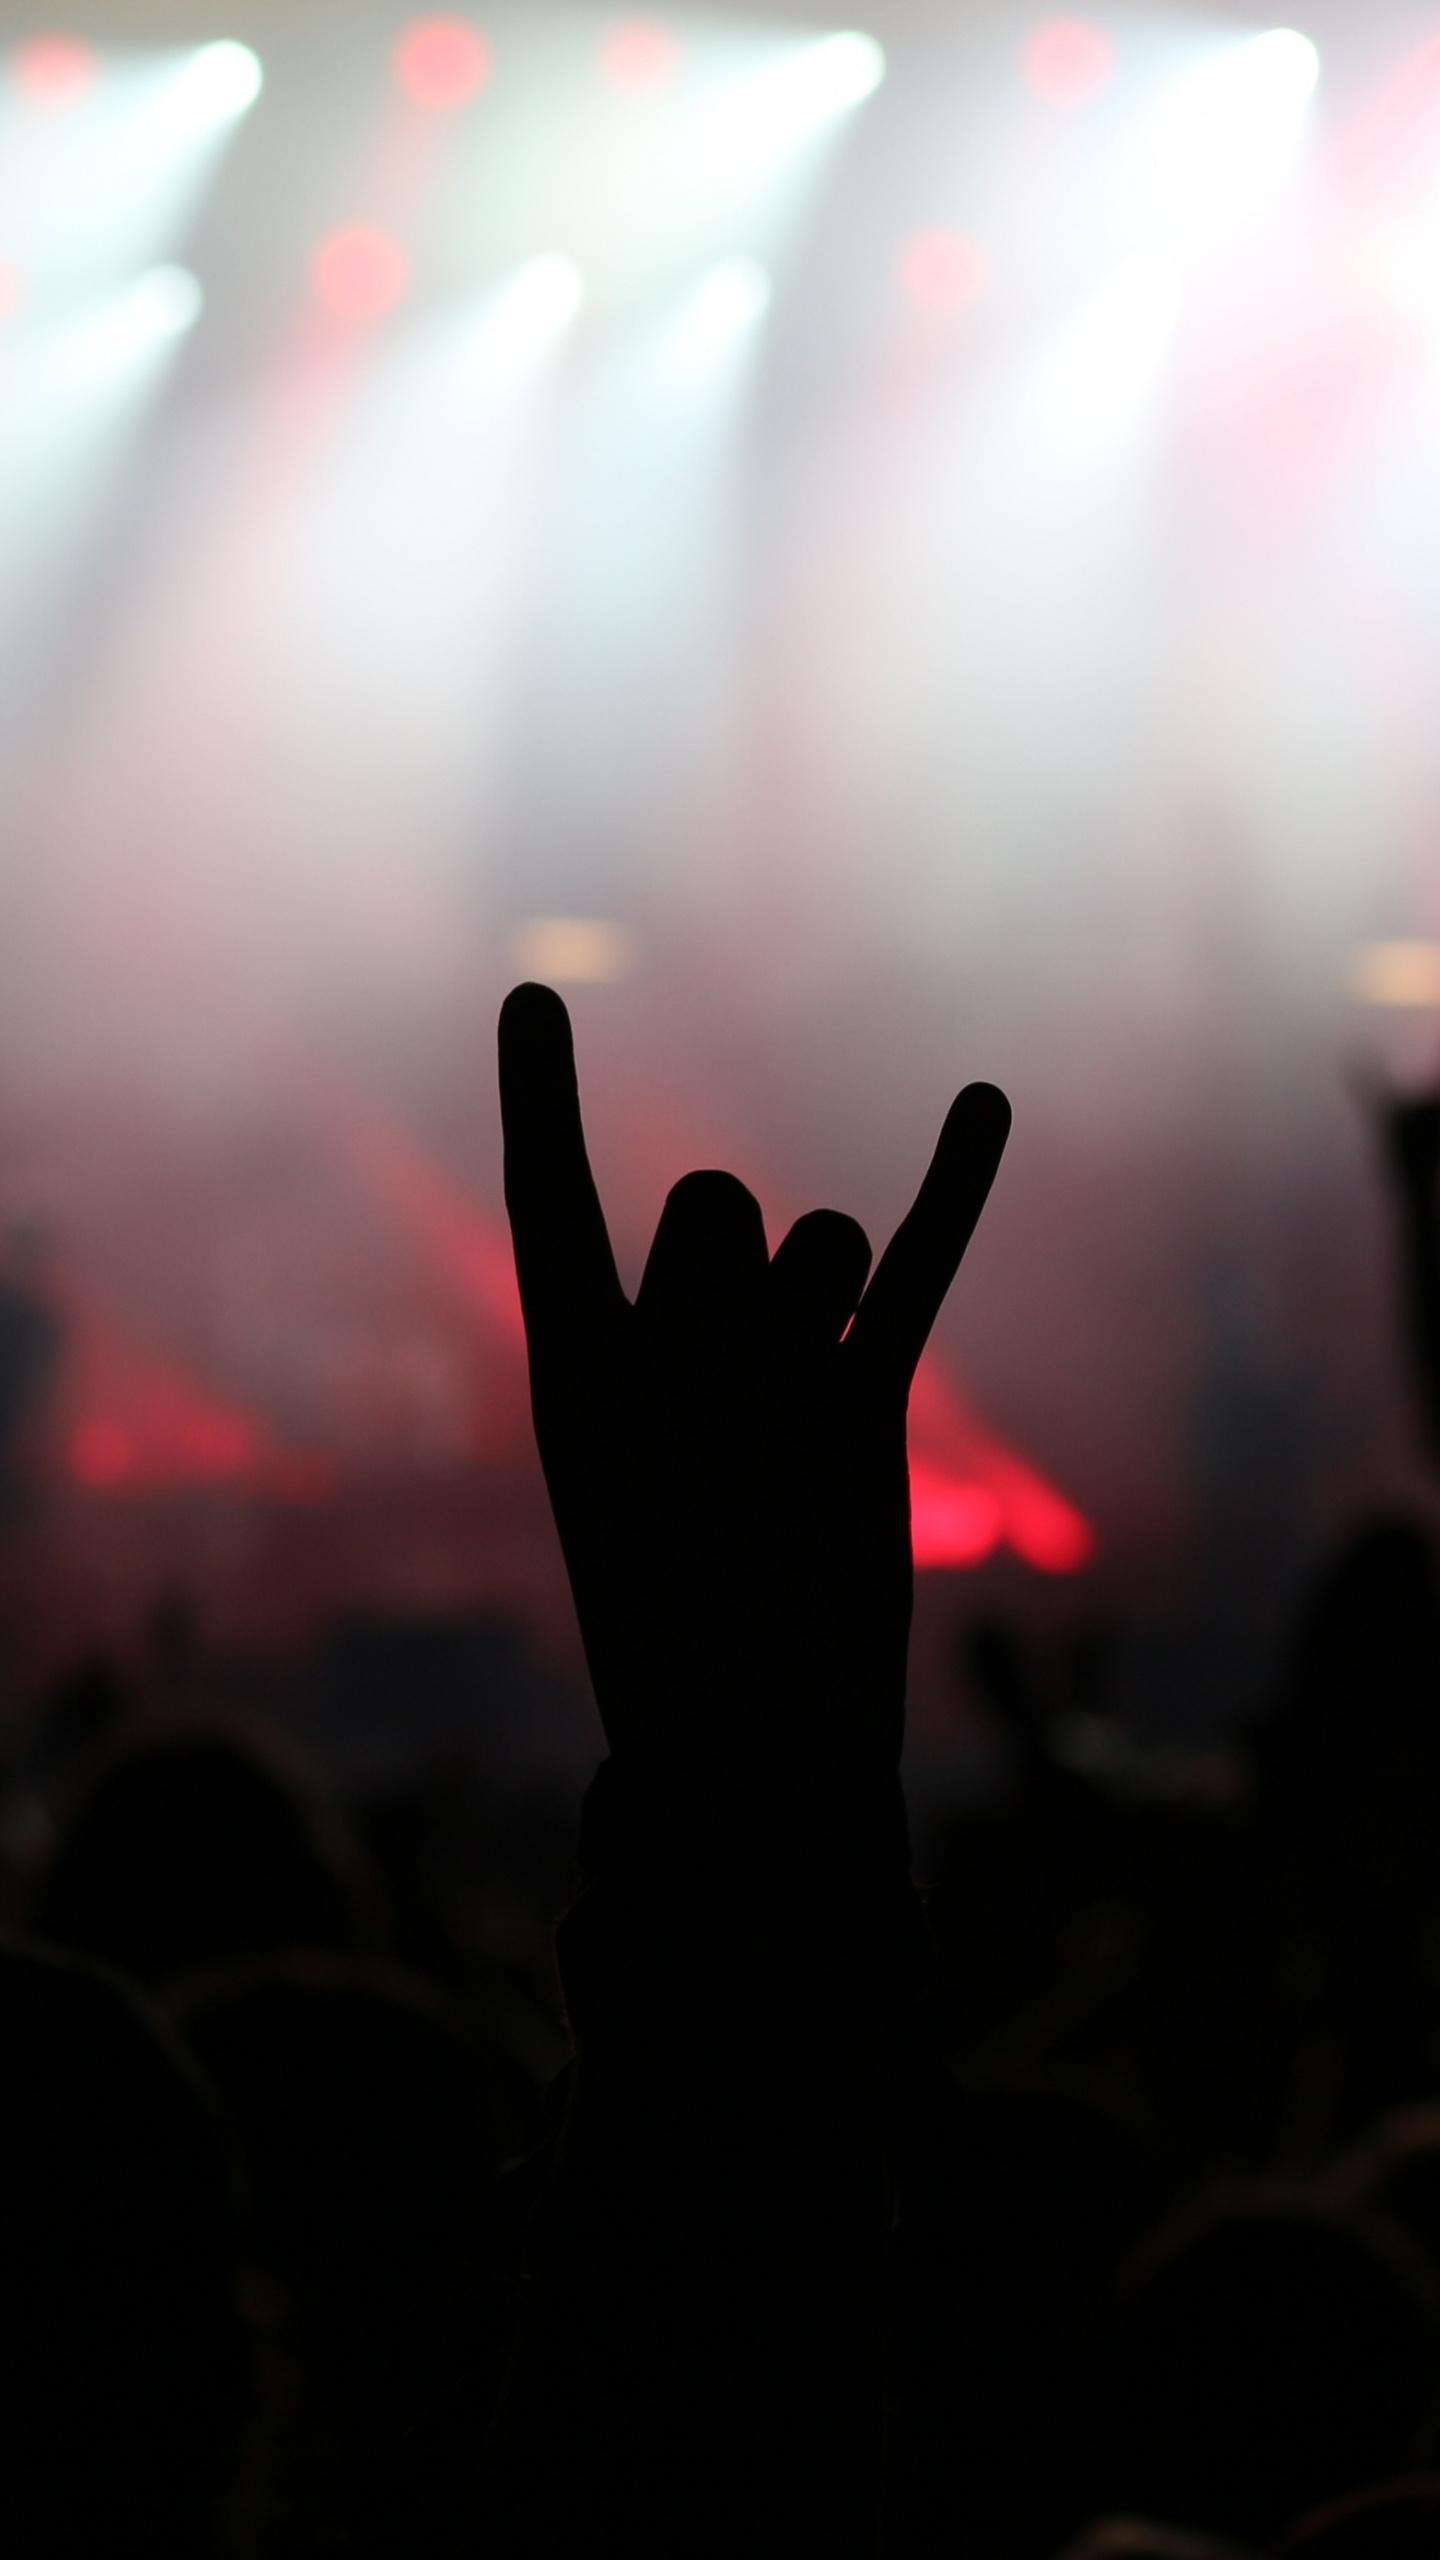 Rock Party, Music Concert, Dance, Hands, Party, Wallpaper - Iphone X Wallpaper Rock Music - HD Wallpaper